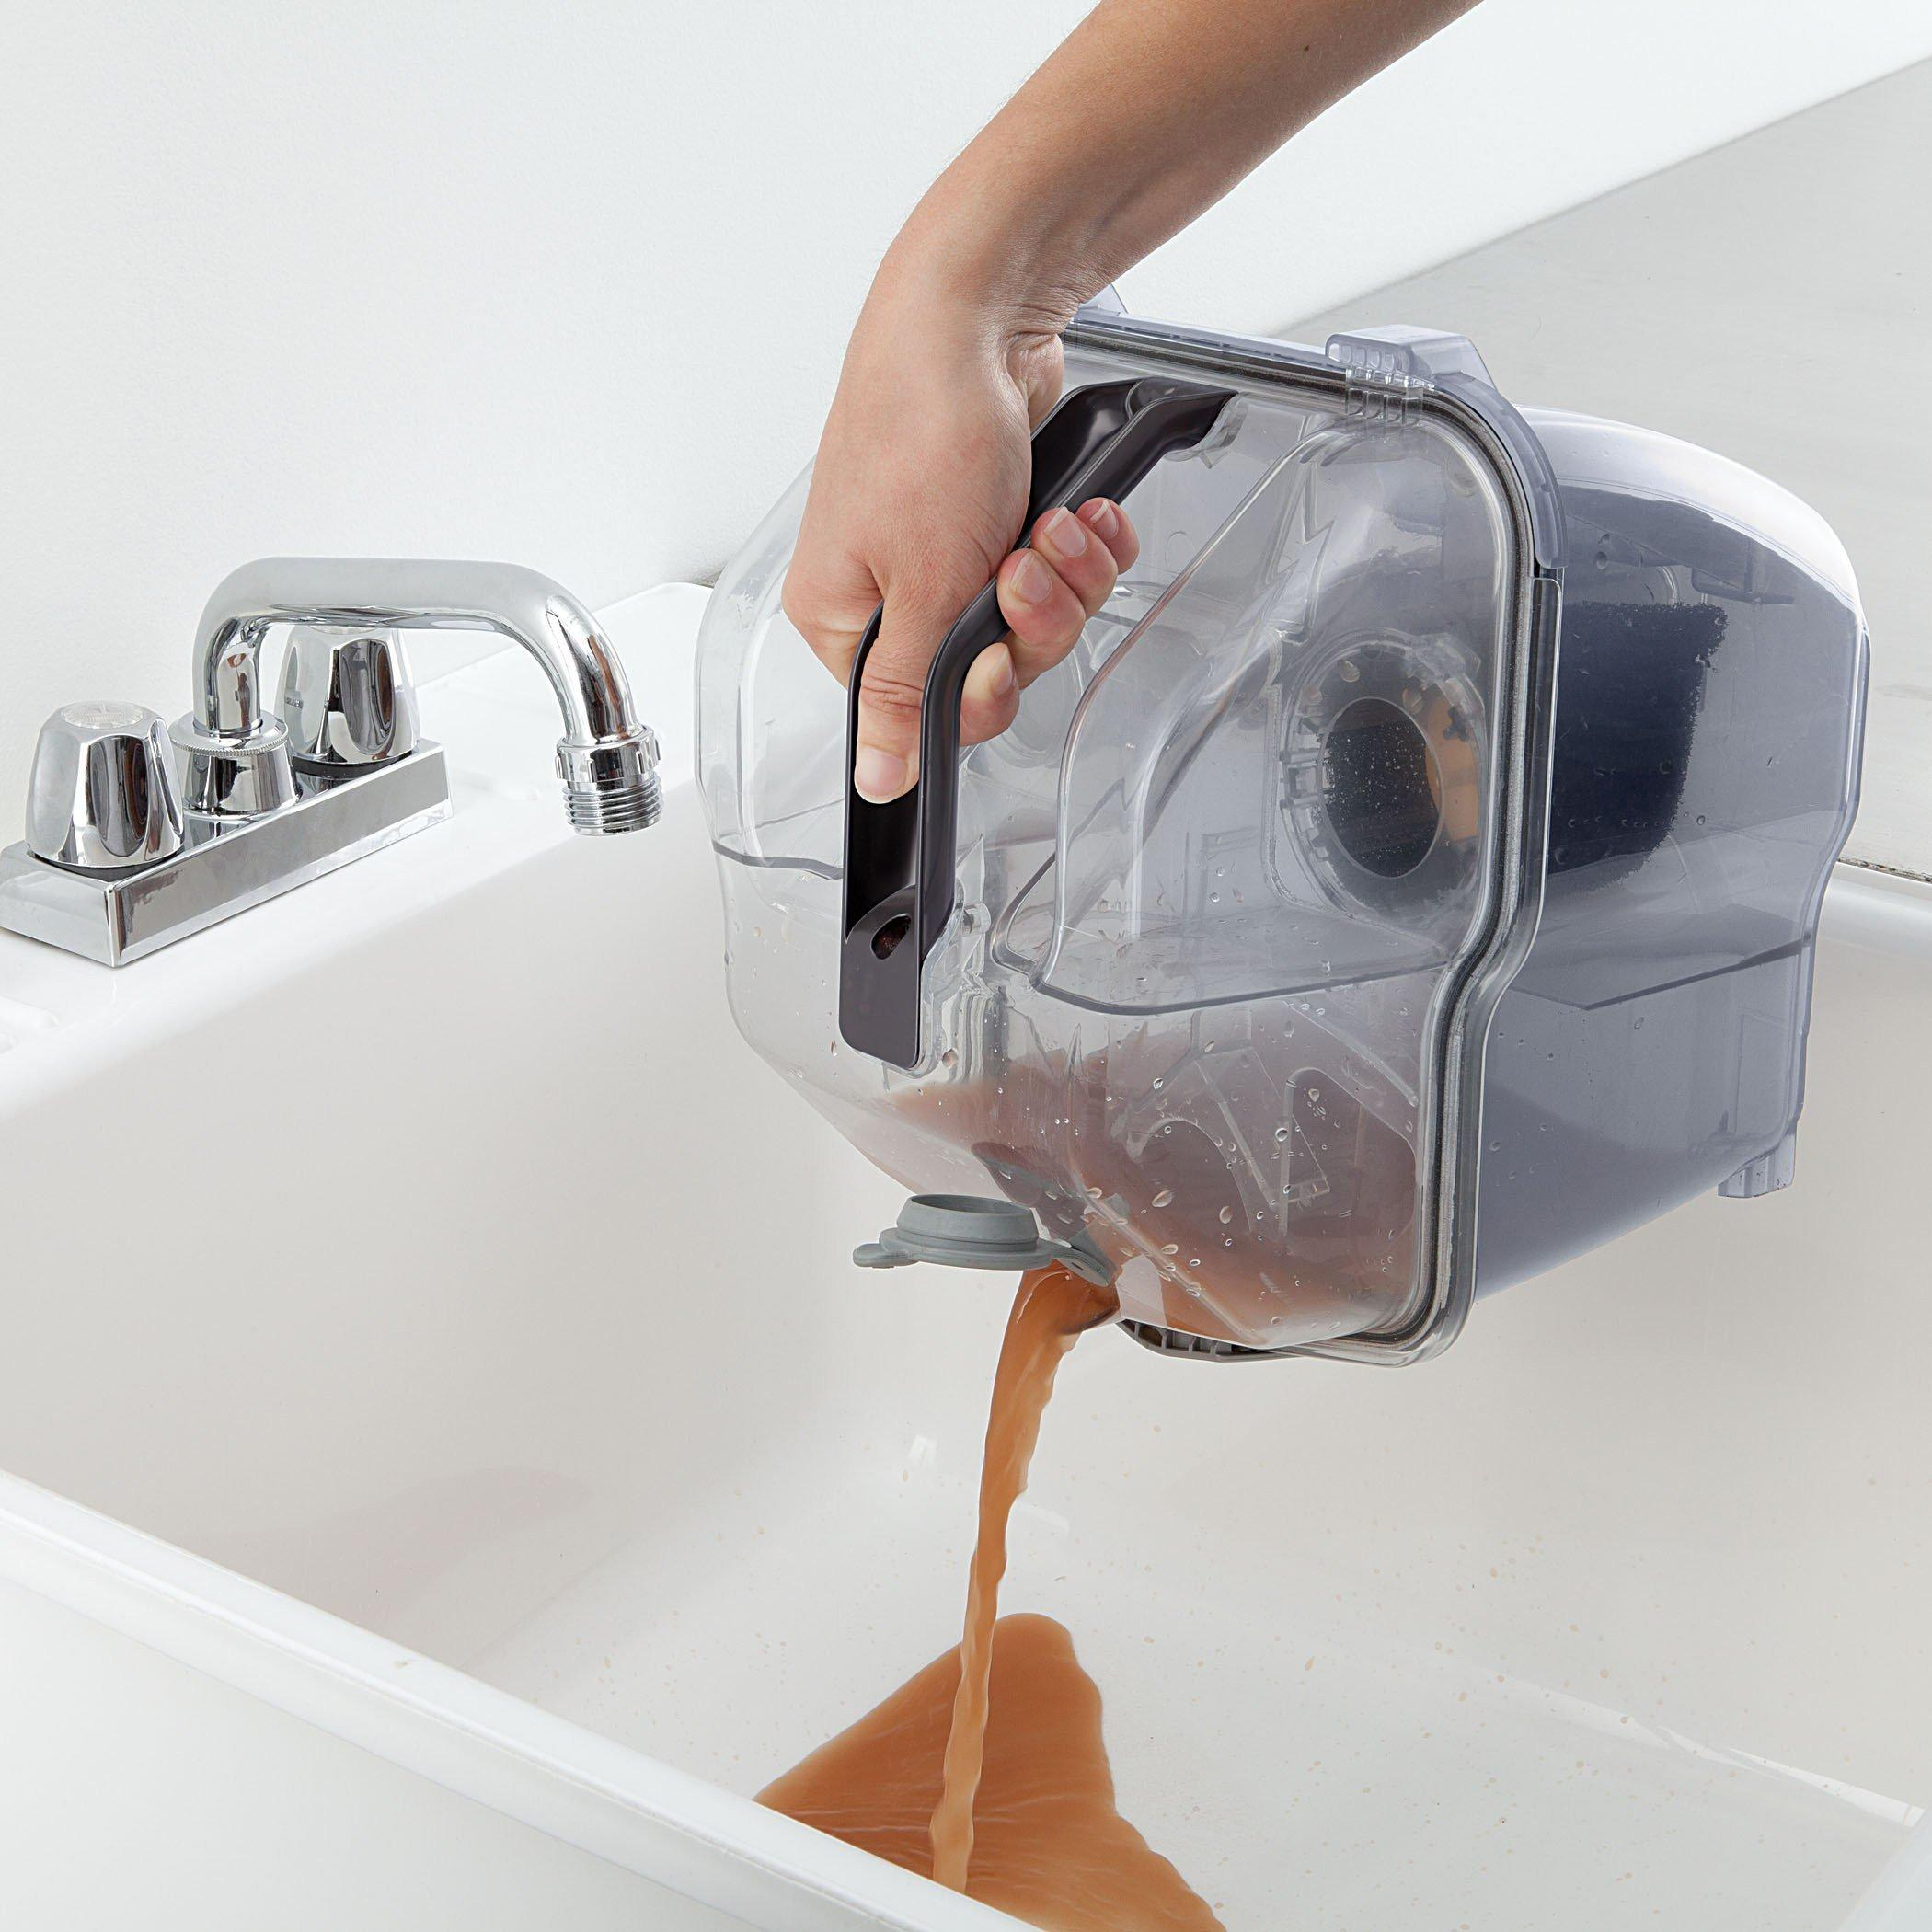 Power Scrub Deluxe Multifloor Carpet Cleaner8